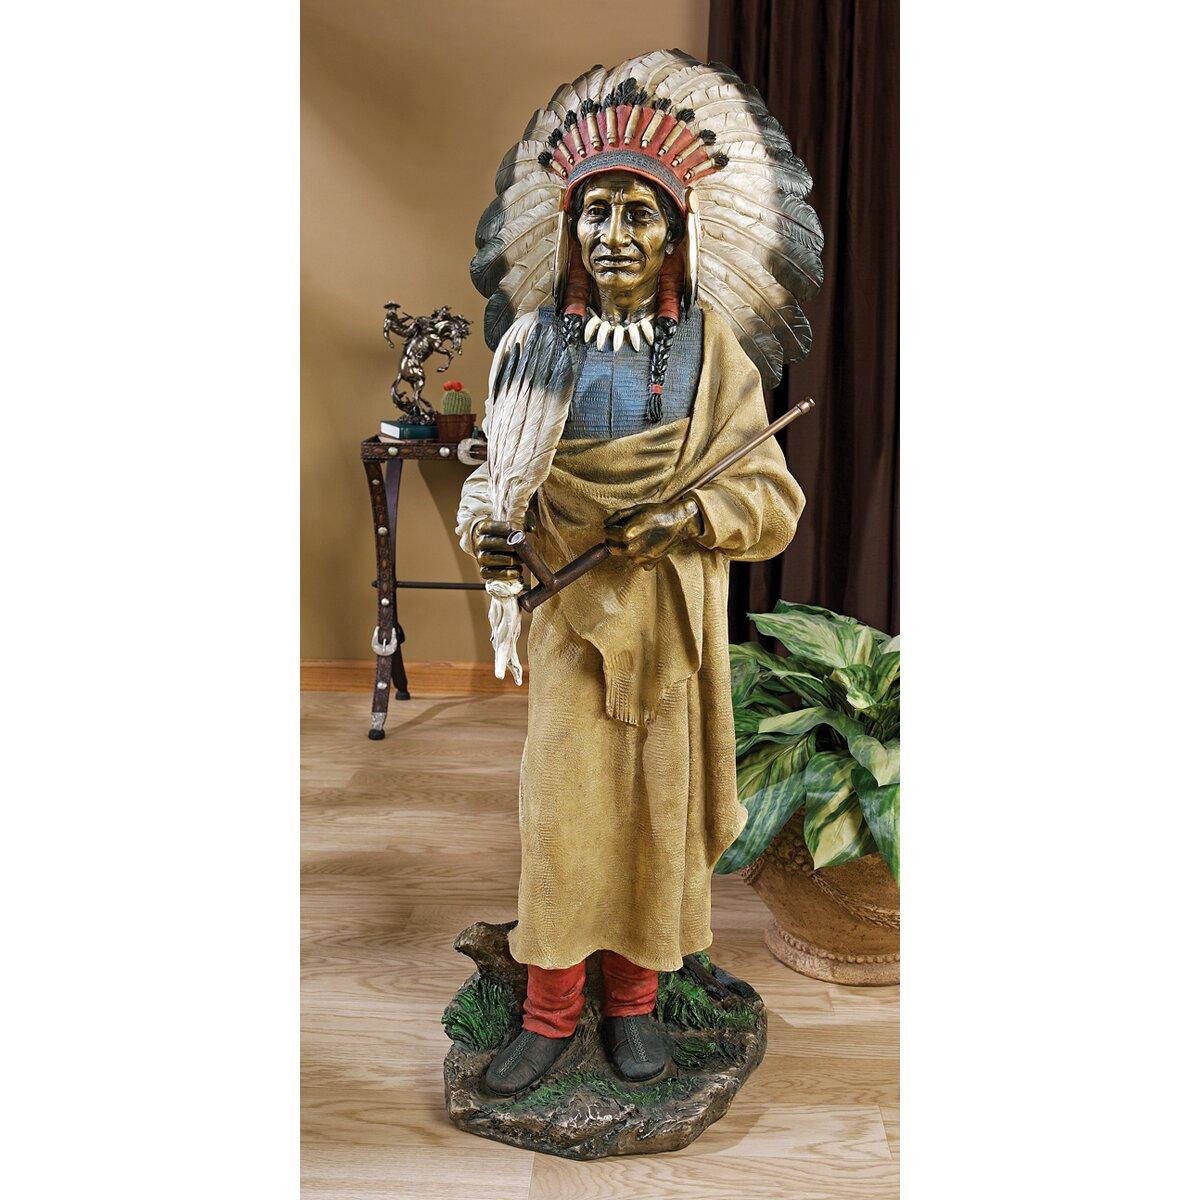 Native American Indian Dog Reviews